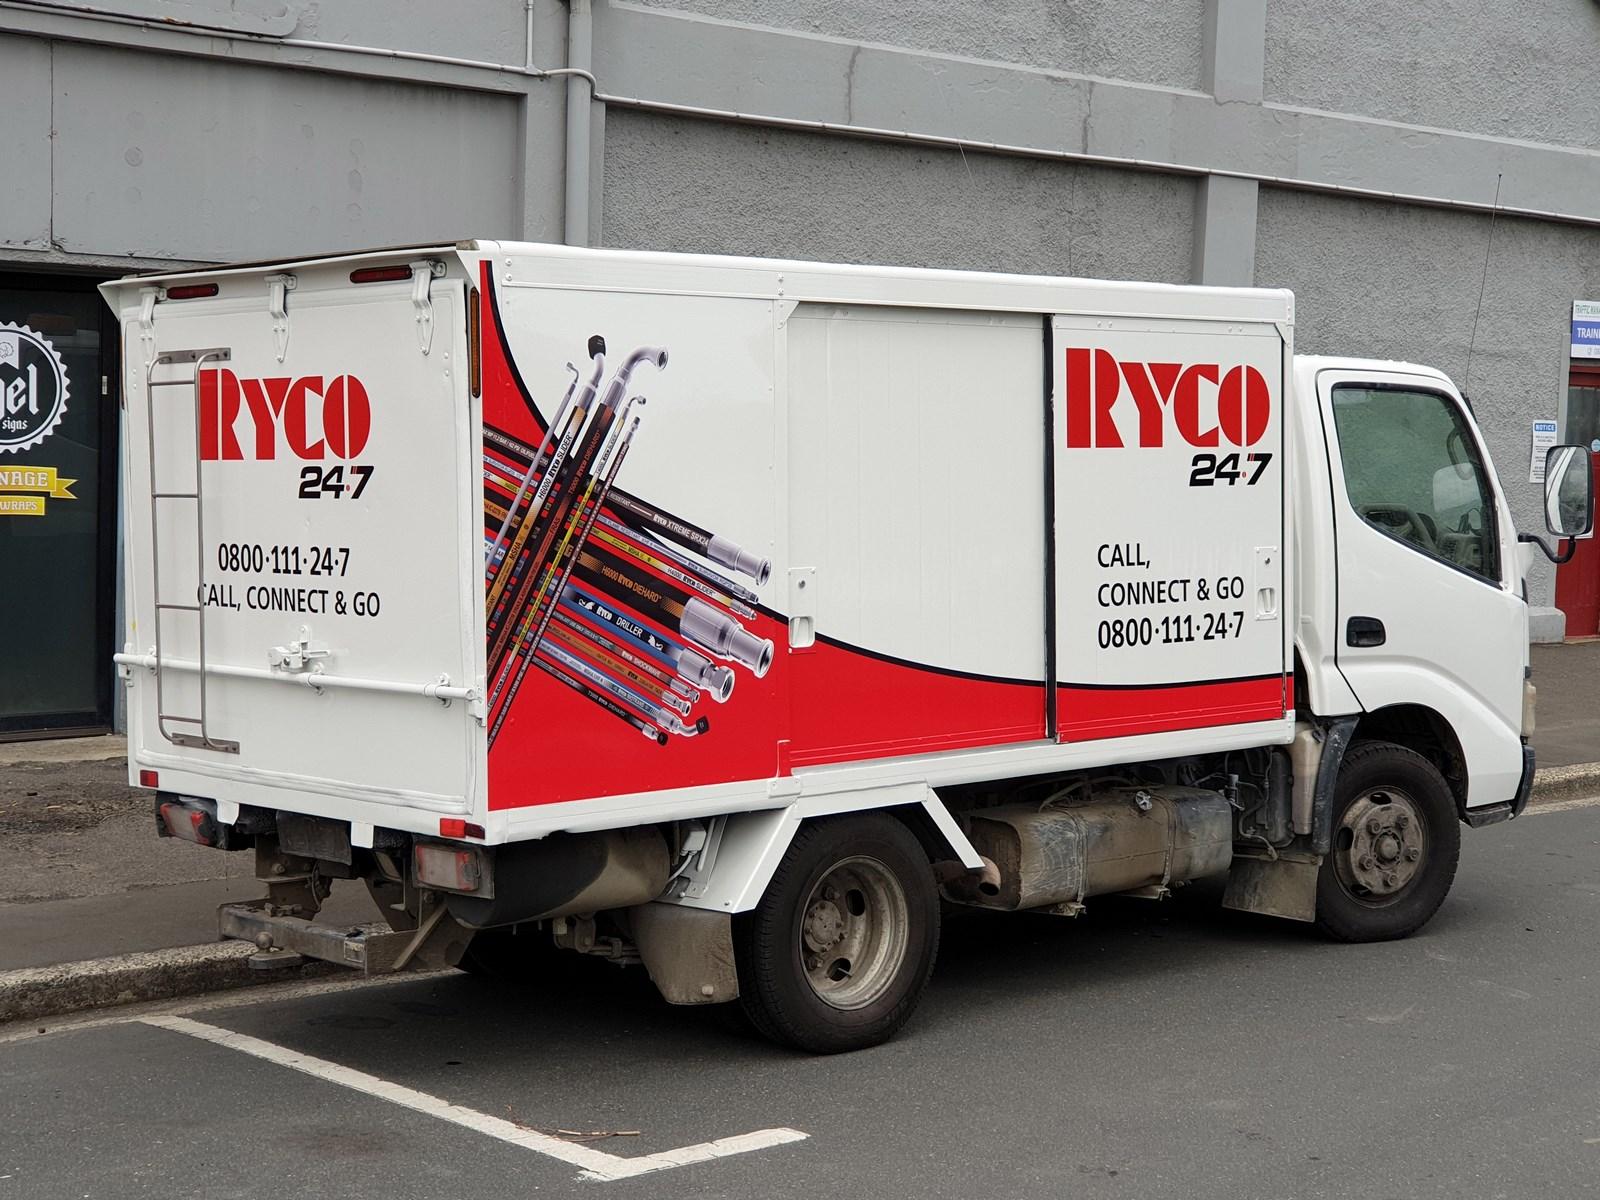 Ryco (Copy).jpg